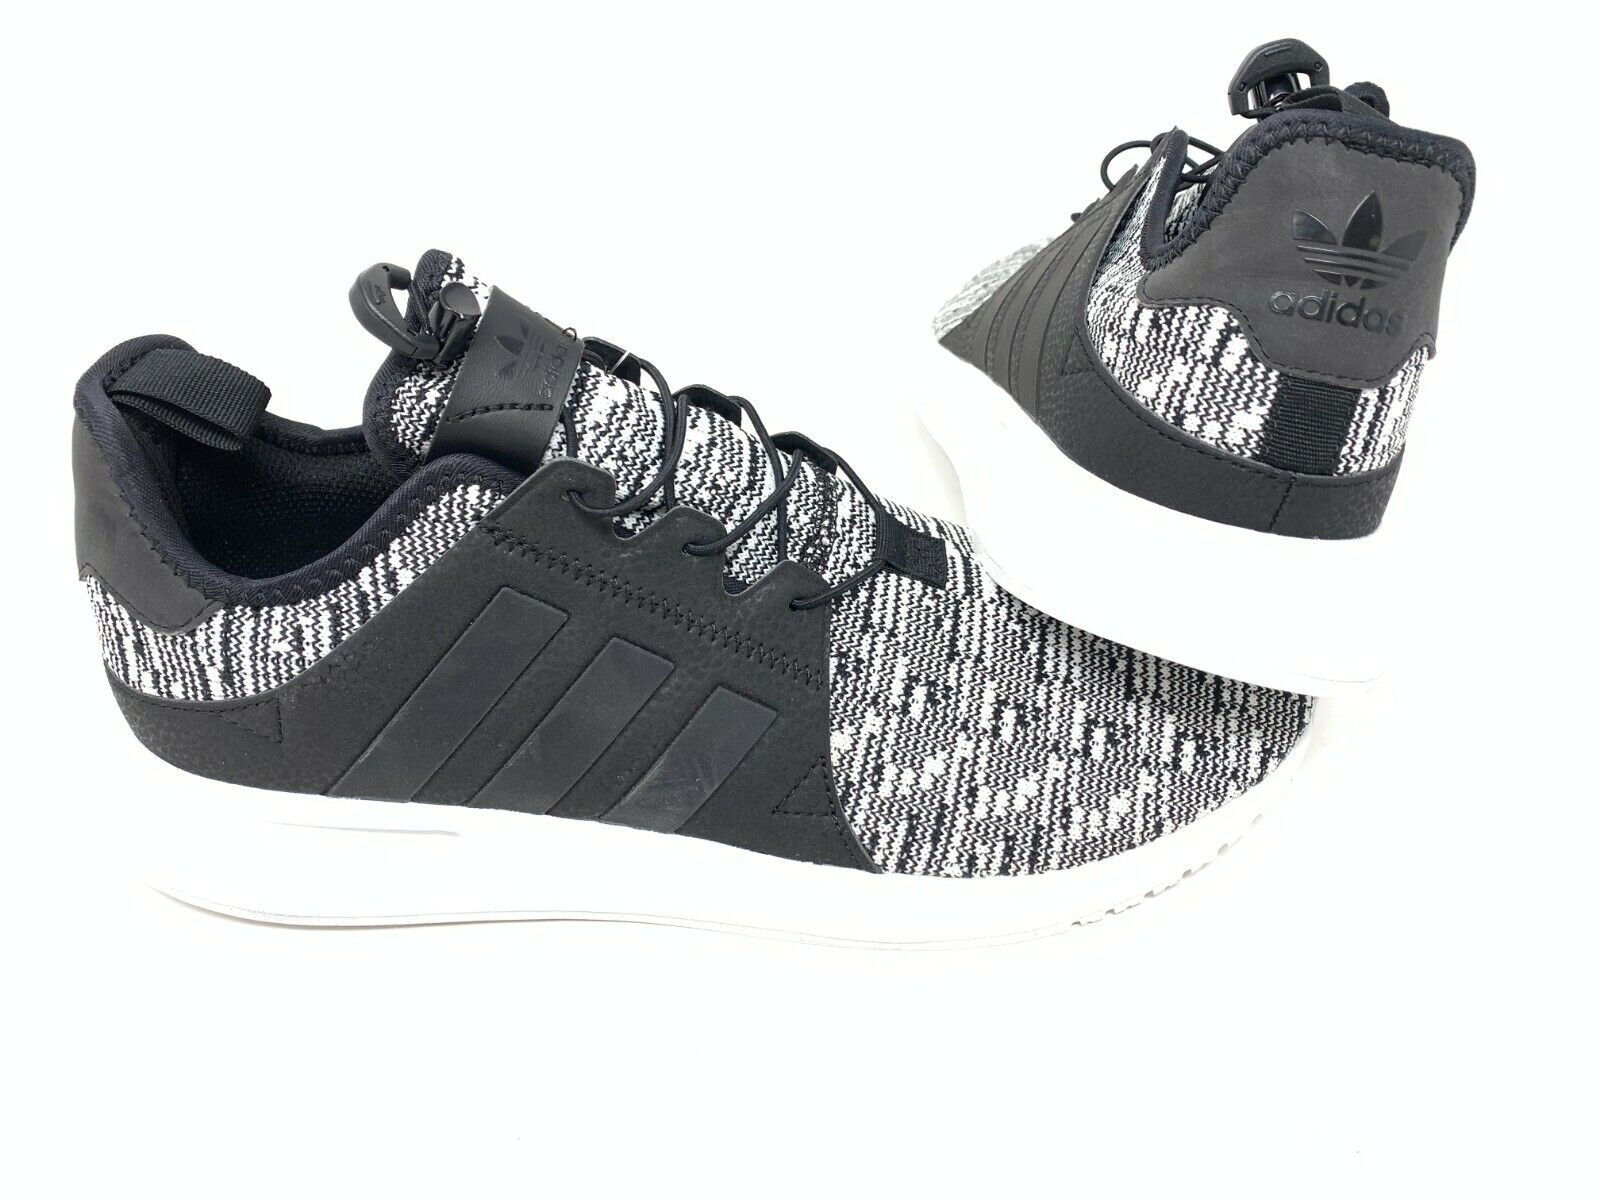 NEW! Adidas Men's X_PLR Originals Running Shoes Blk/White Si